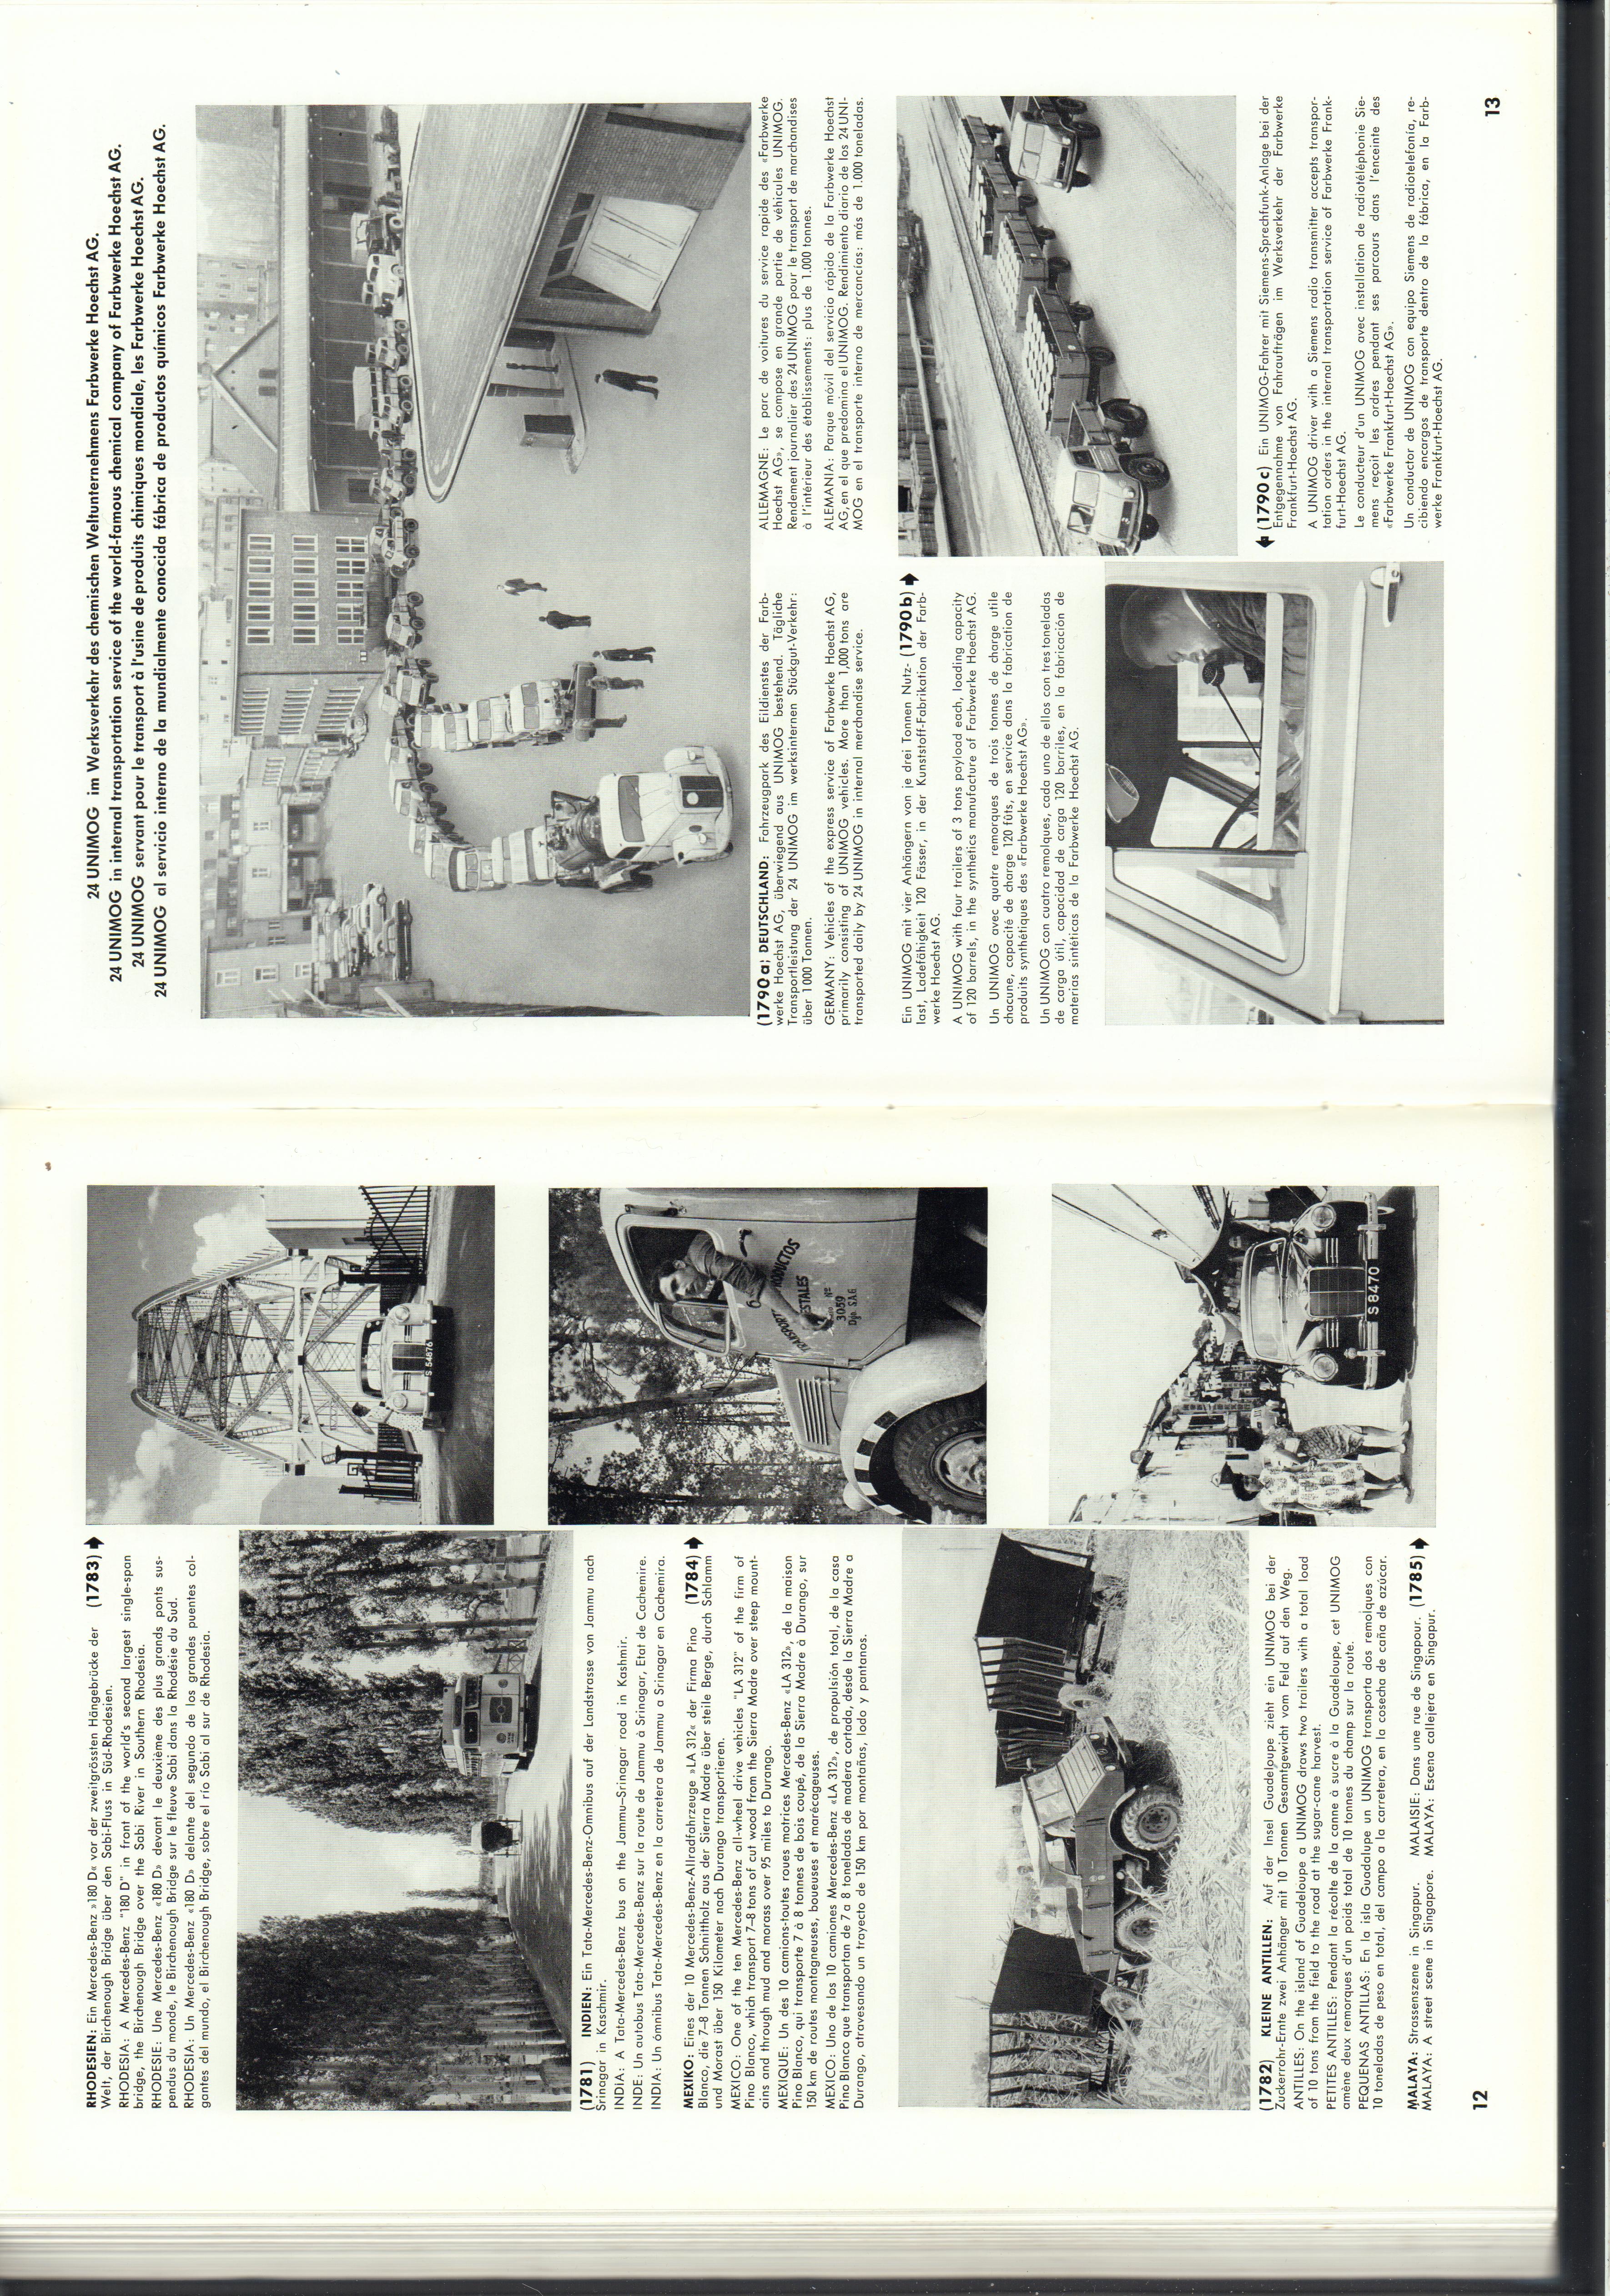 (REVISTA): Periódico In aller welt n.º 14 - Mercedes-Benz no mundo - 1957 - multilingue 007